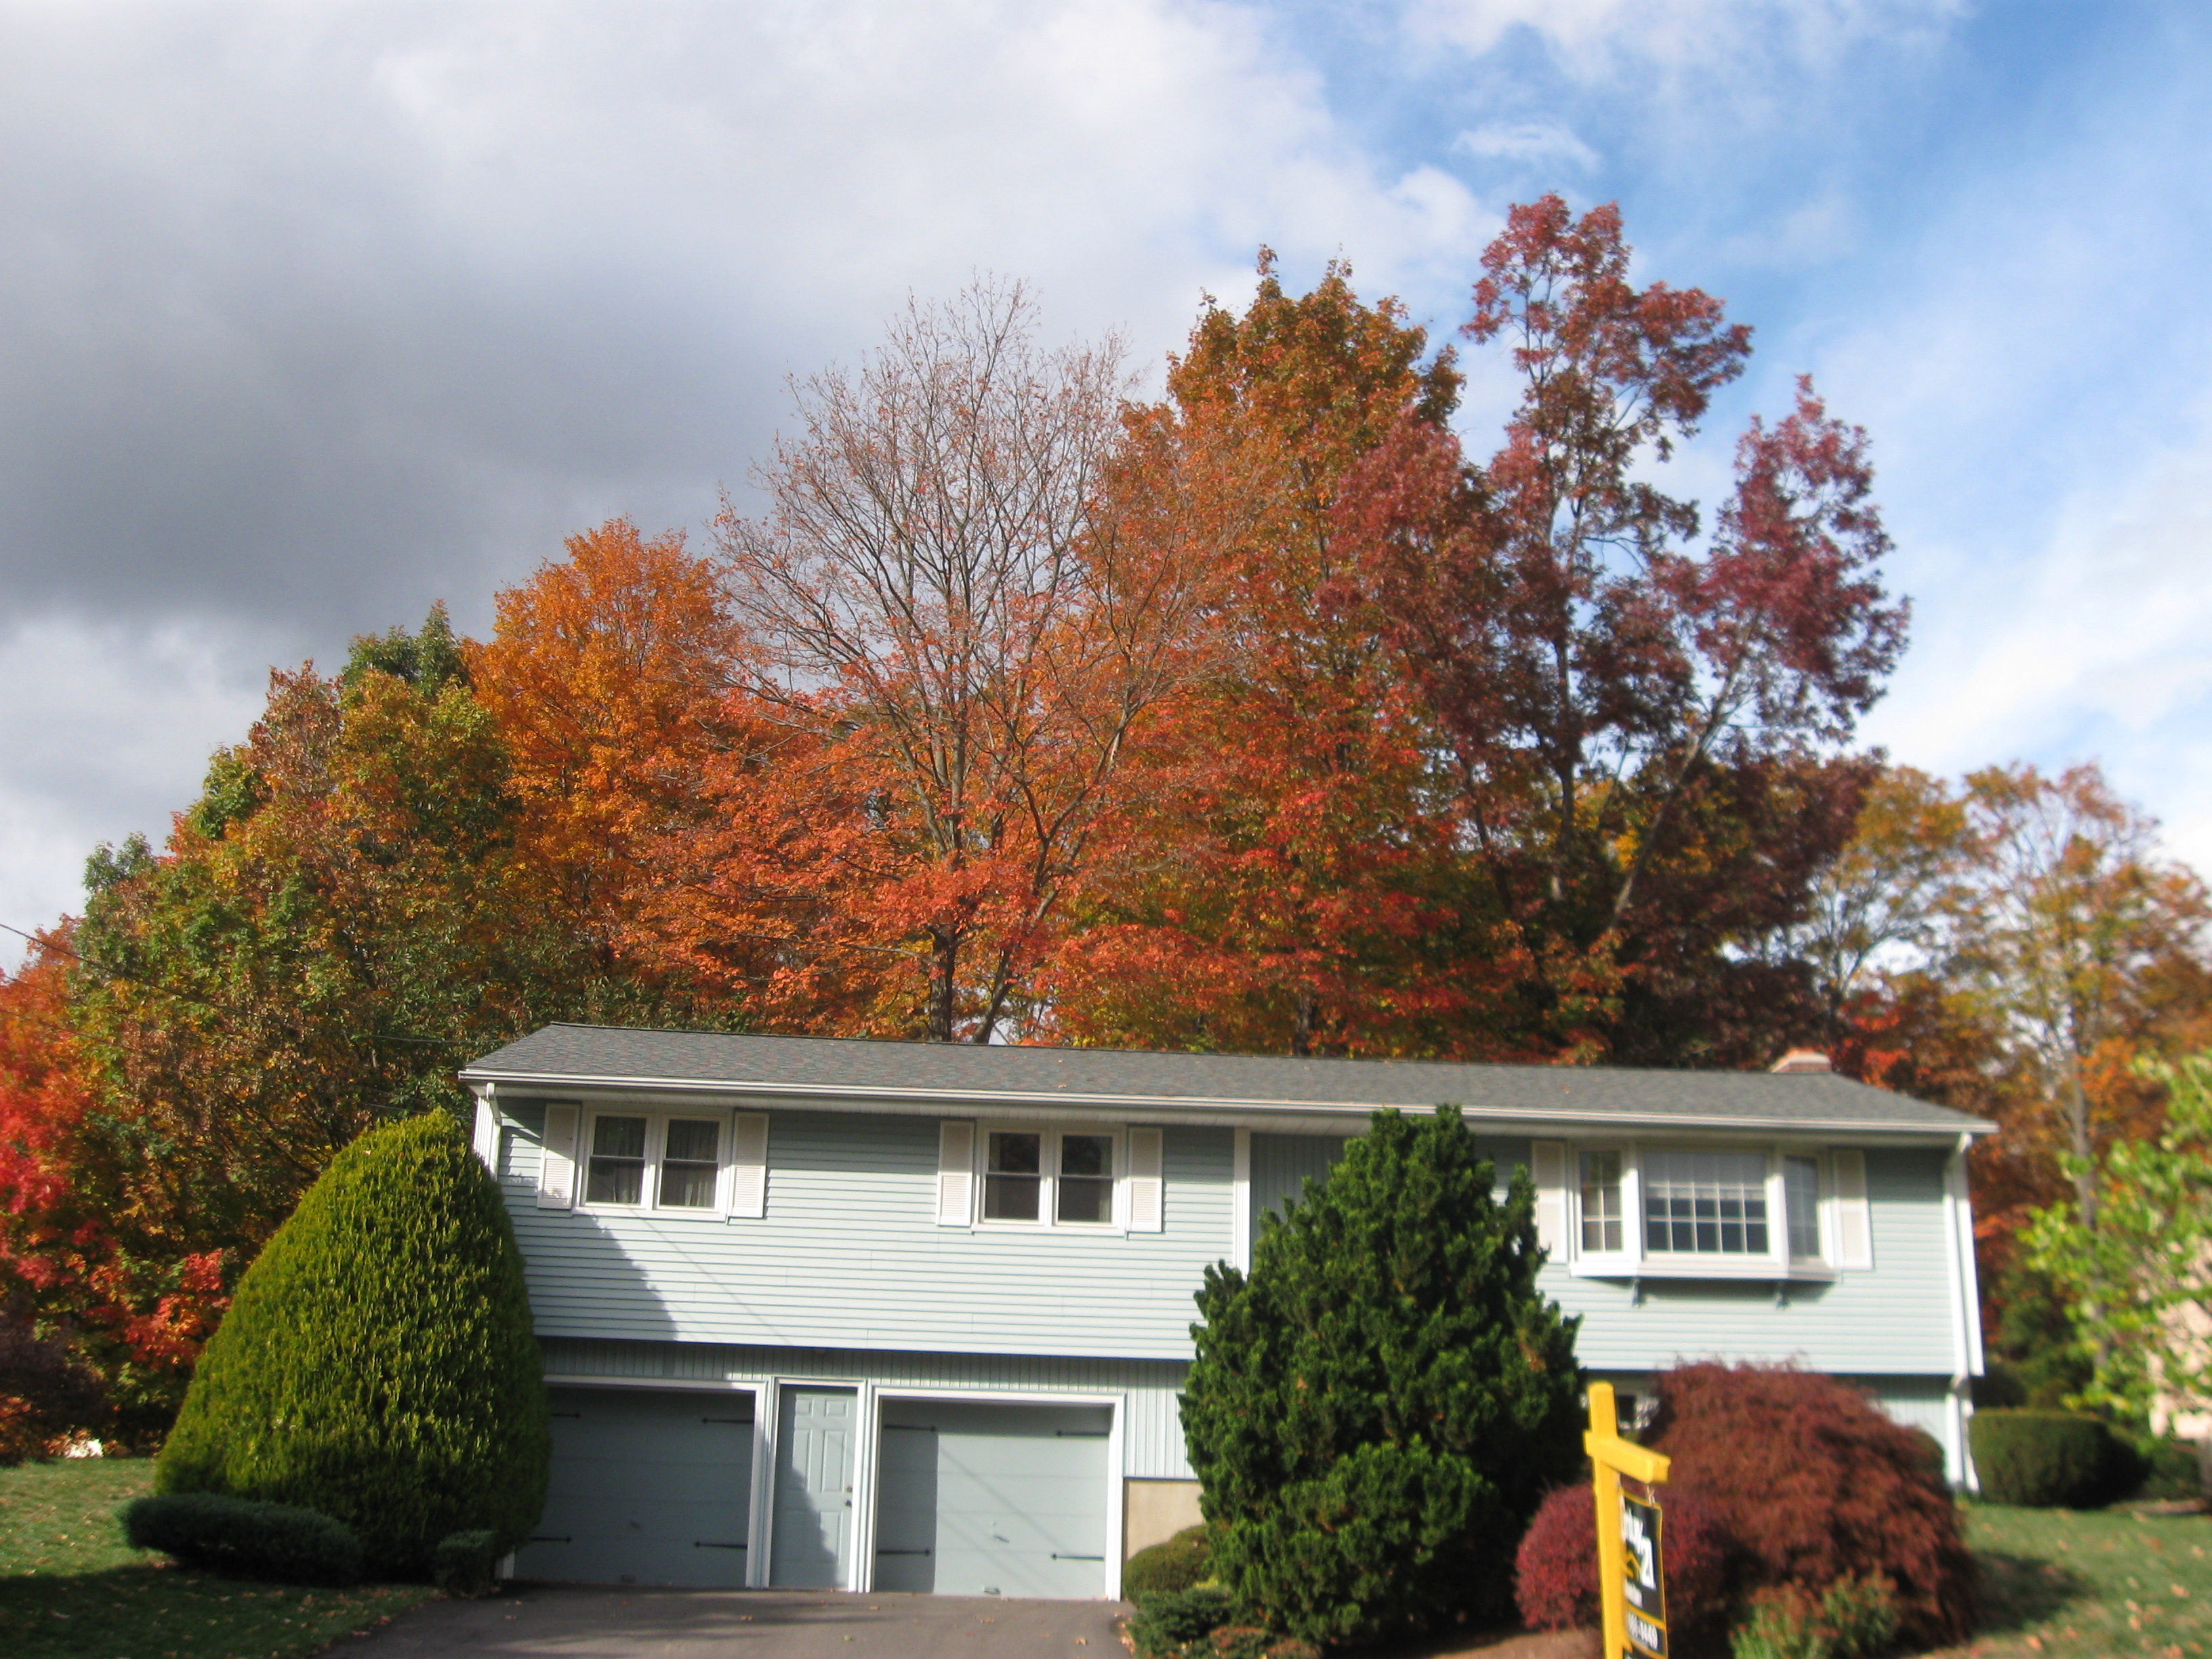 238 Lamp Lighter Lane, Newington, Connecticut 06111